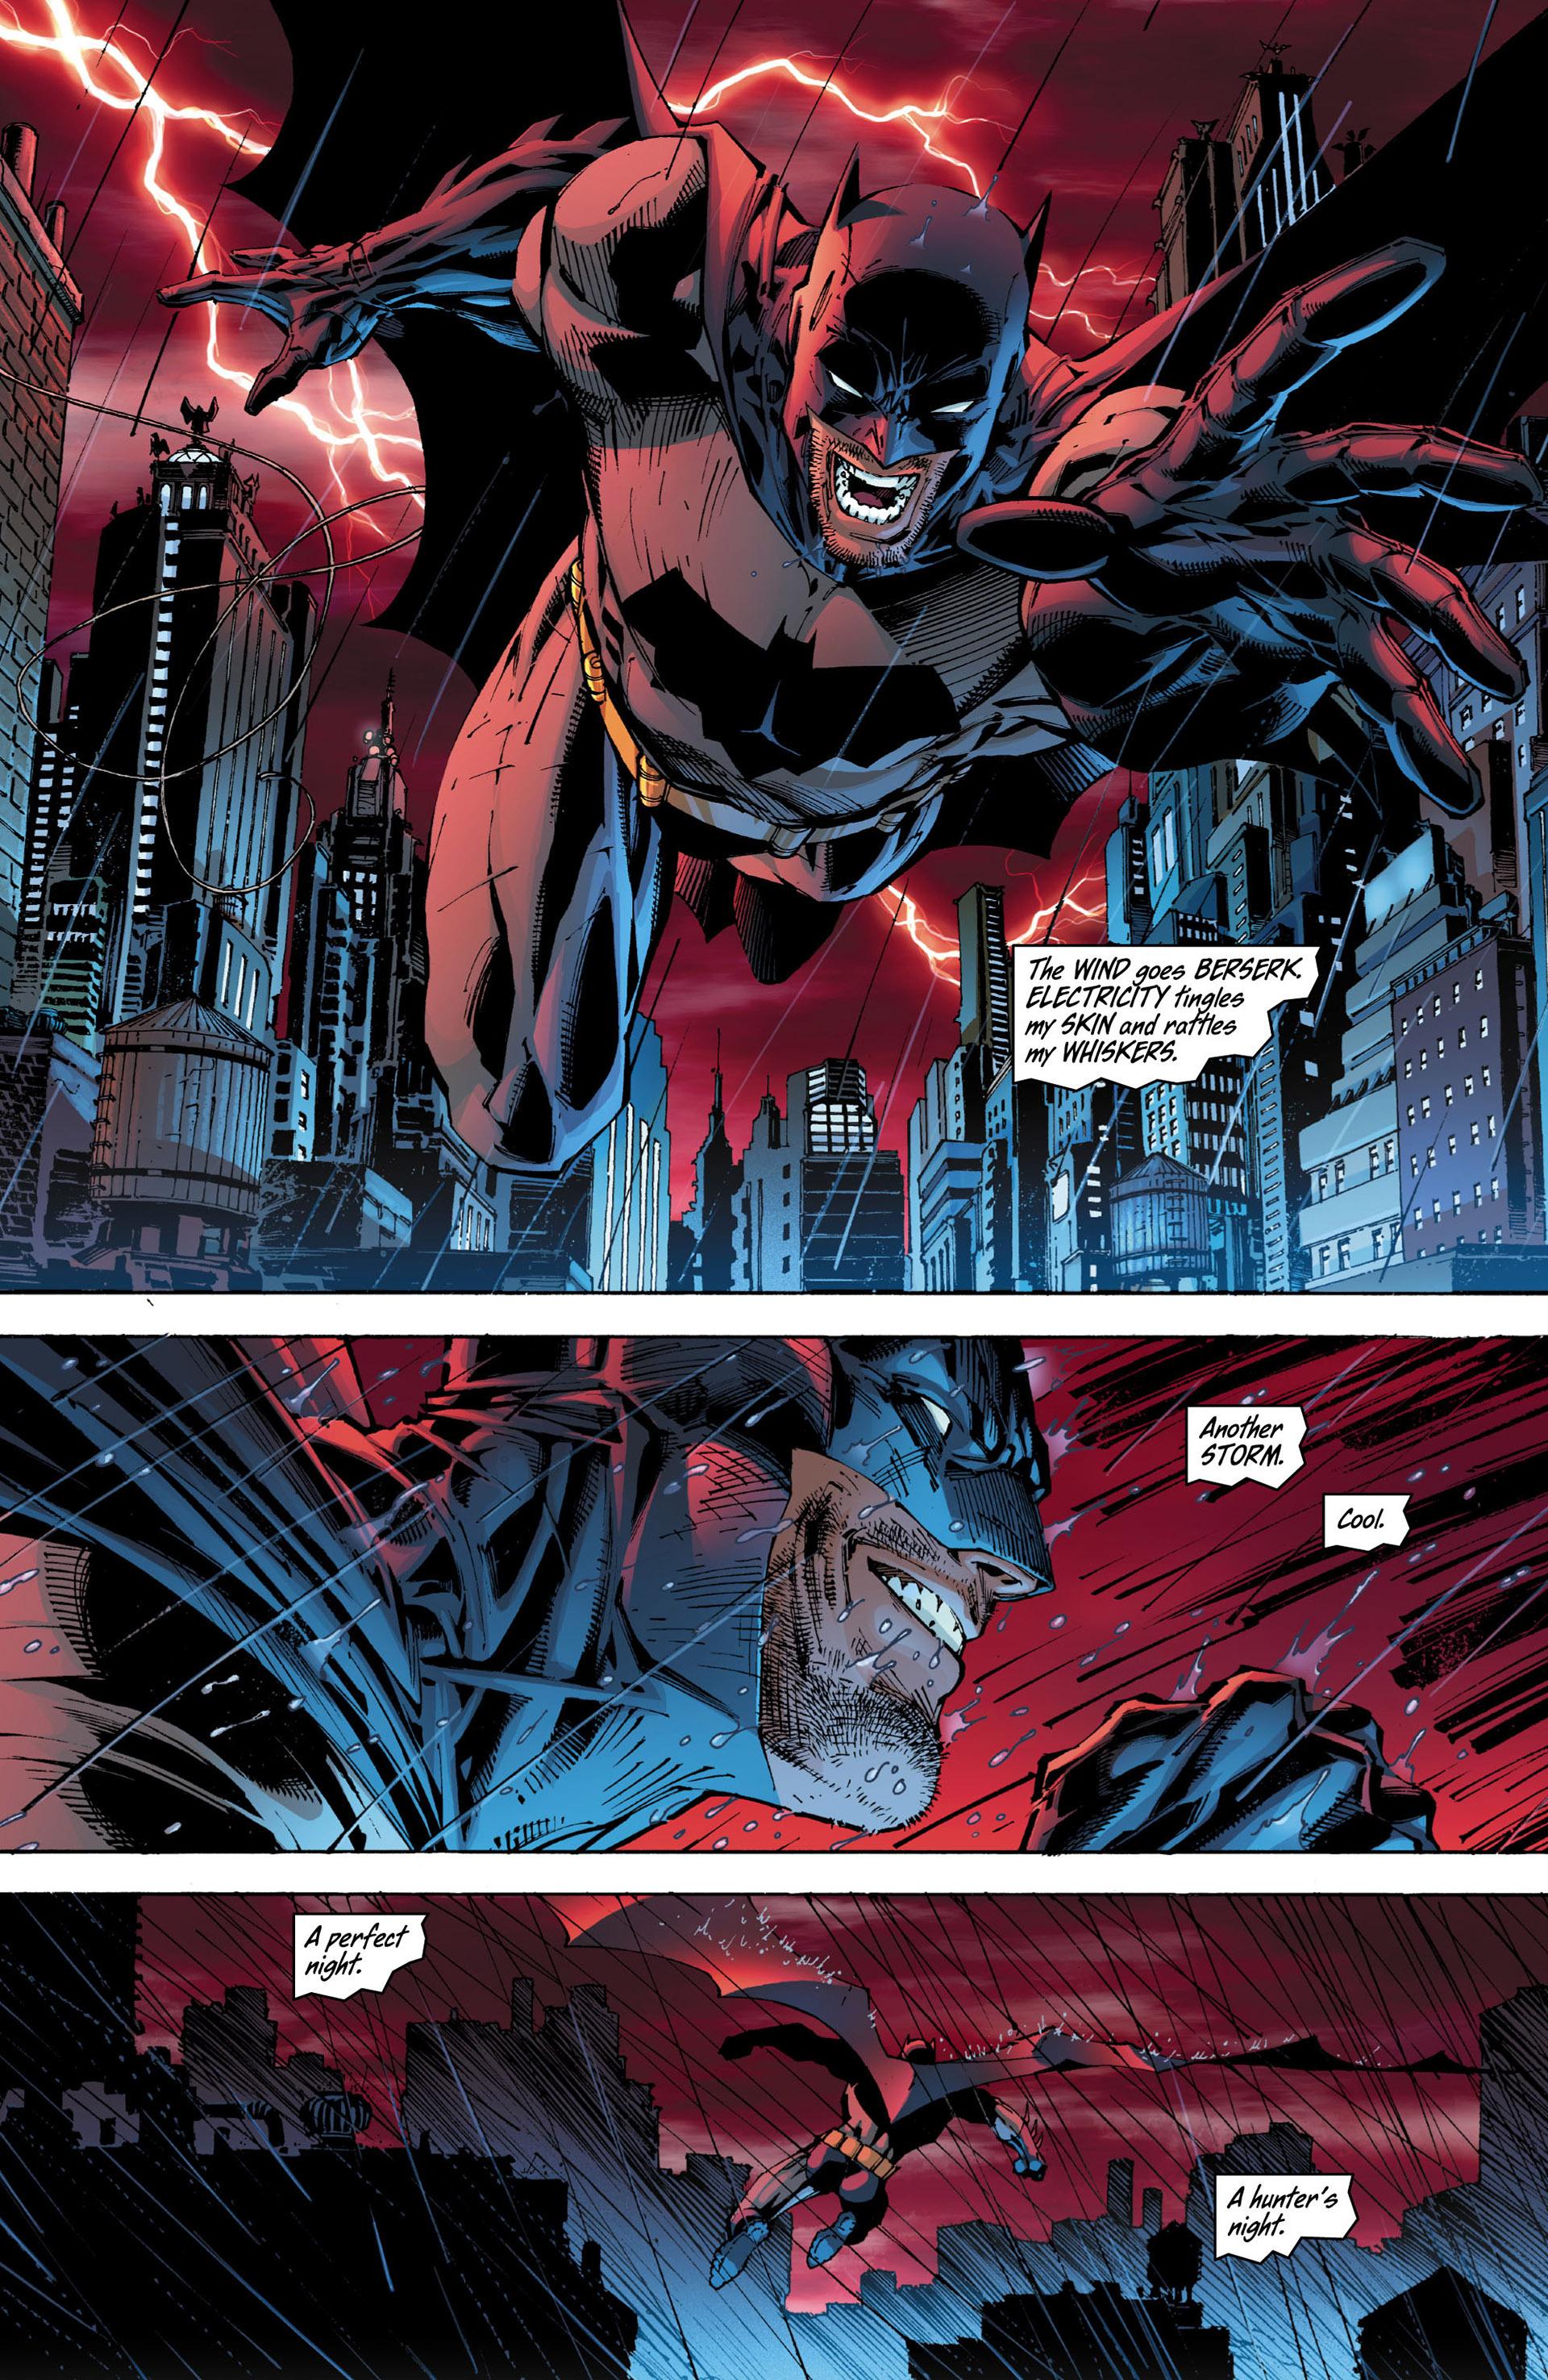 Read online All Star Batman & Robin, The Boy Wonder comic -  Issue #5 - 17